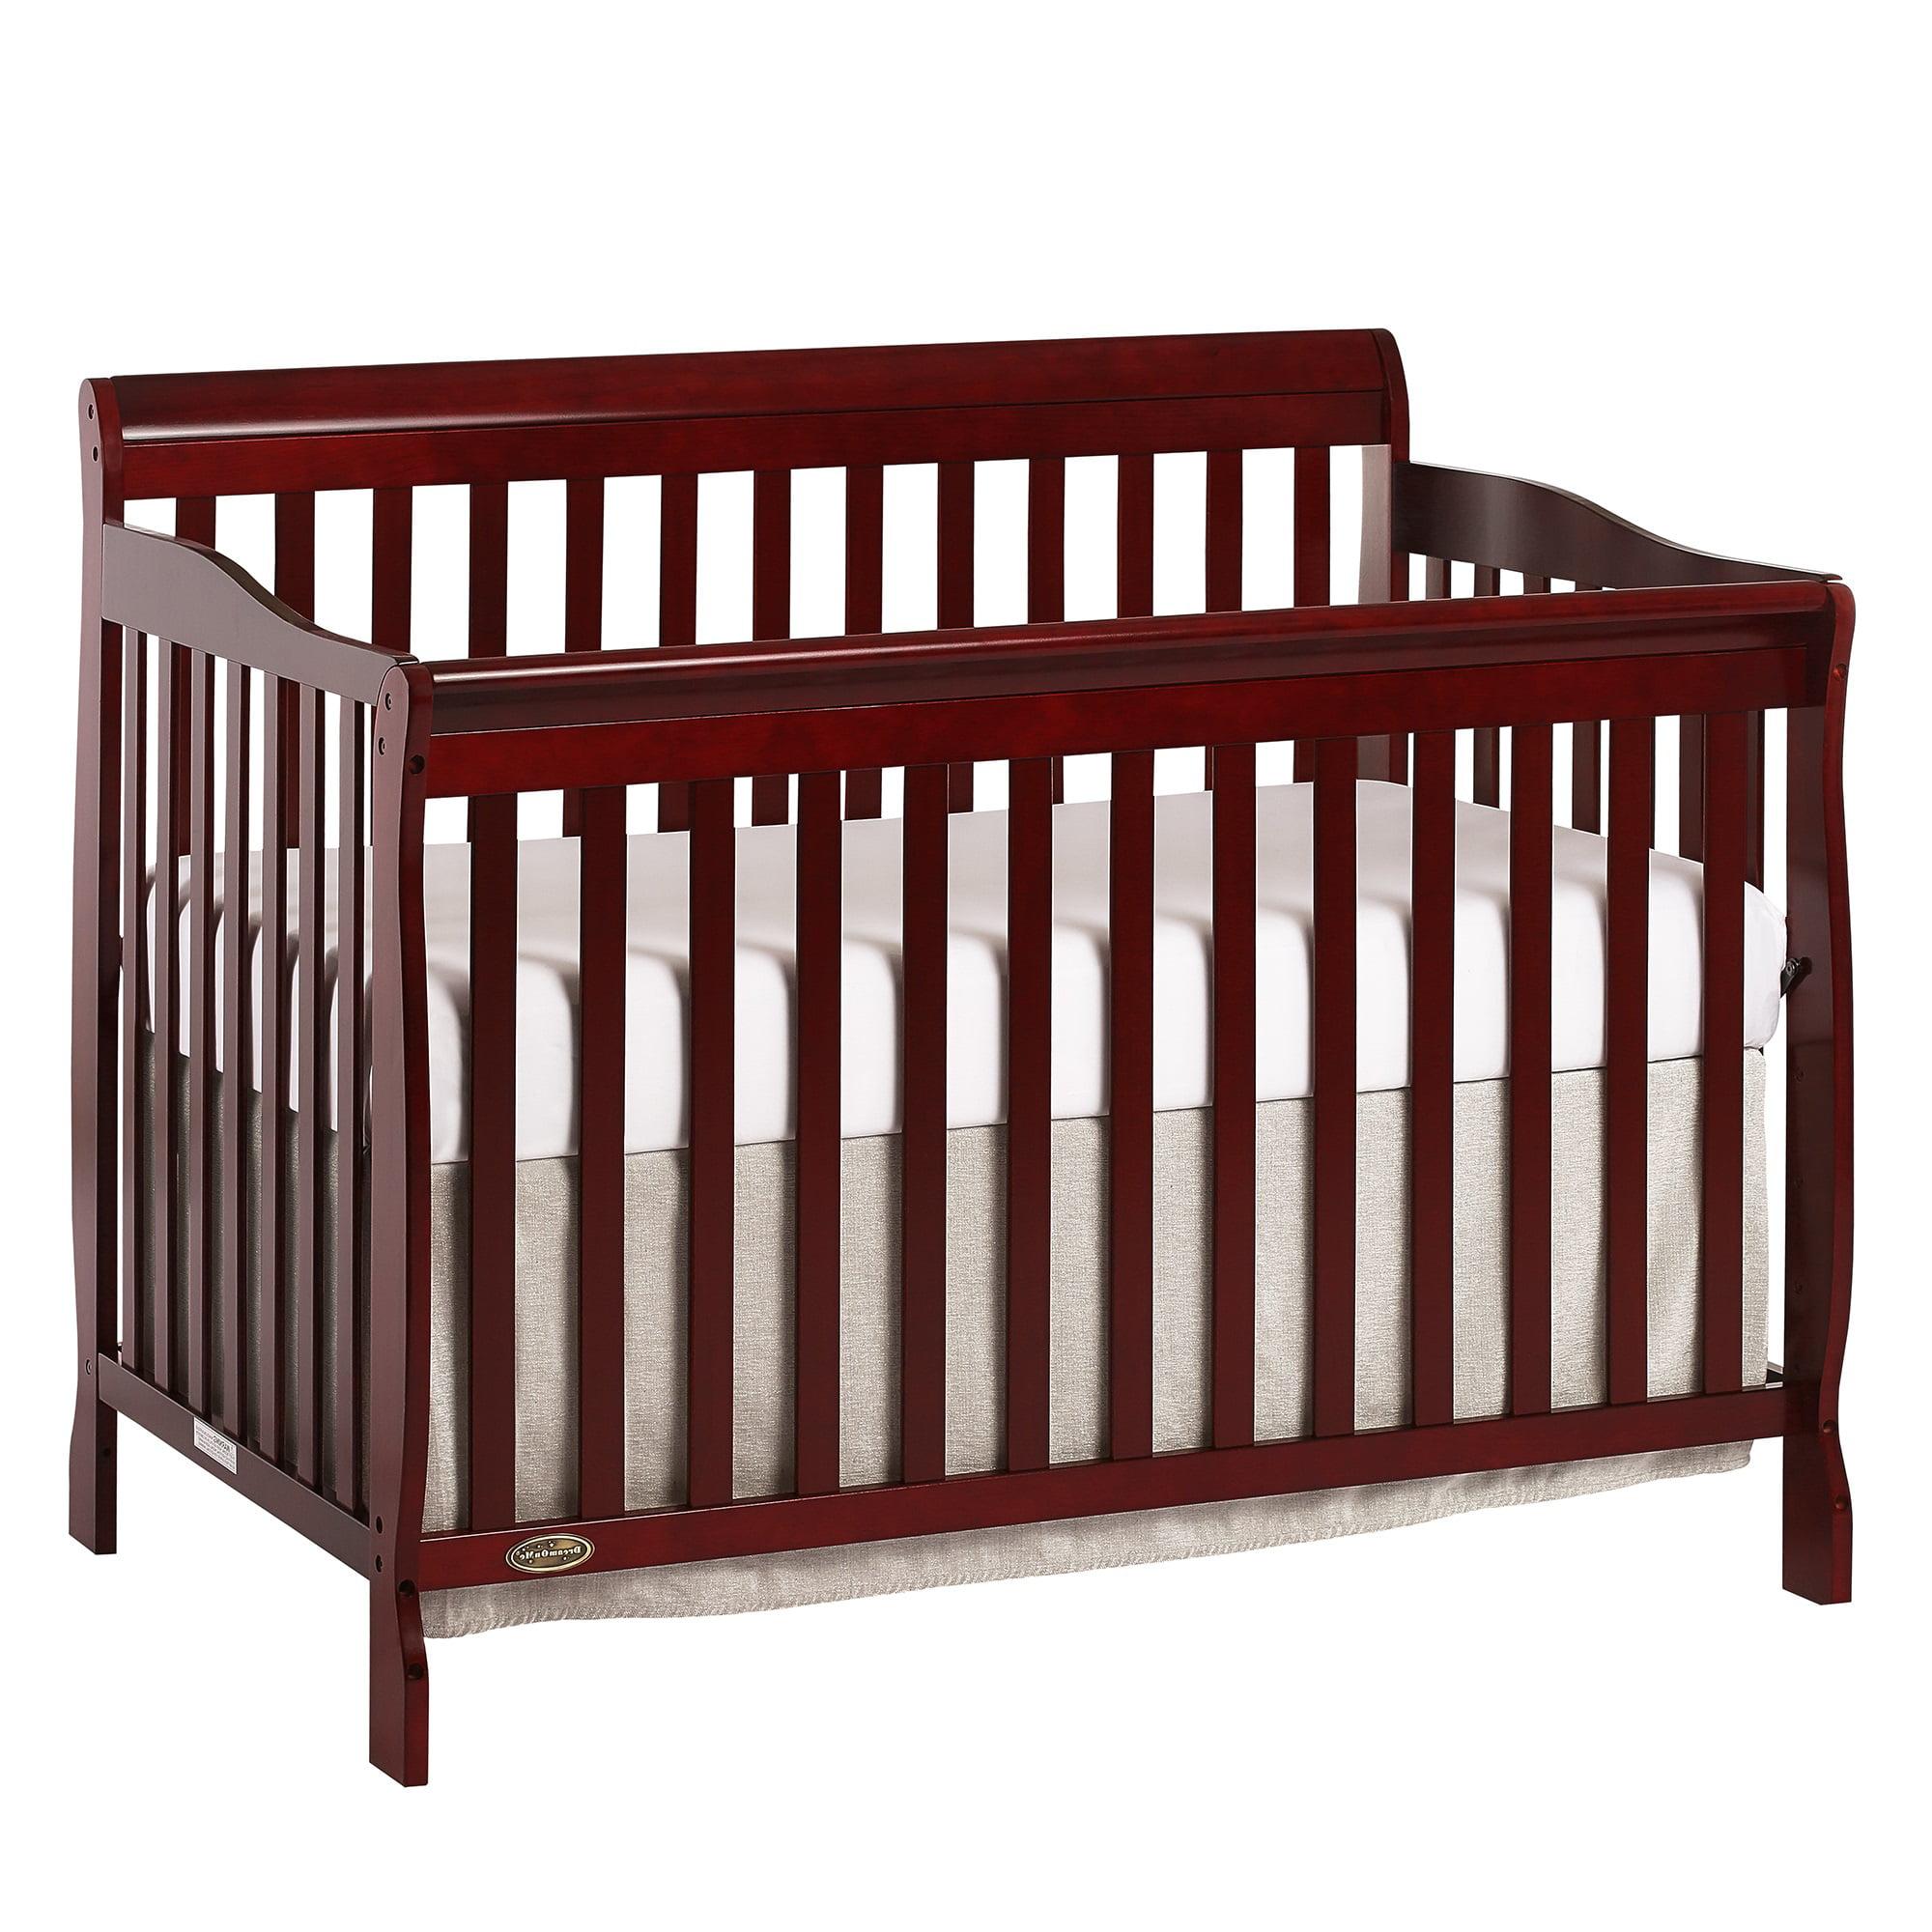 Dream On Me Ashton 5-in-1 Convertible Crib, Cherry